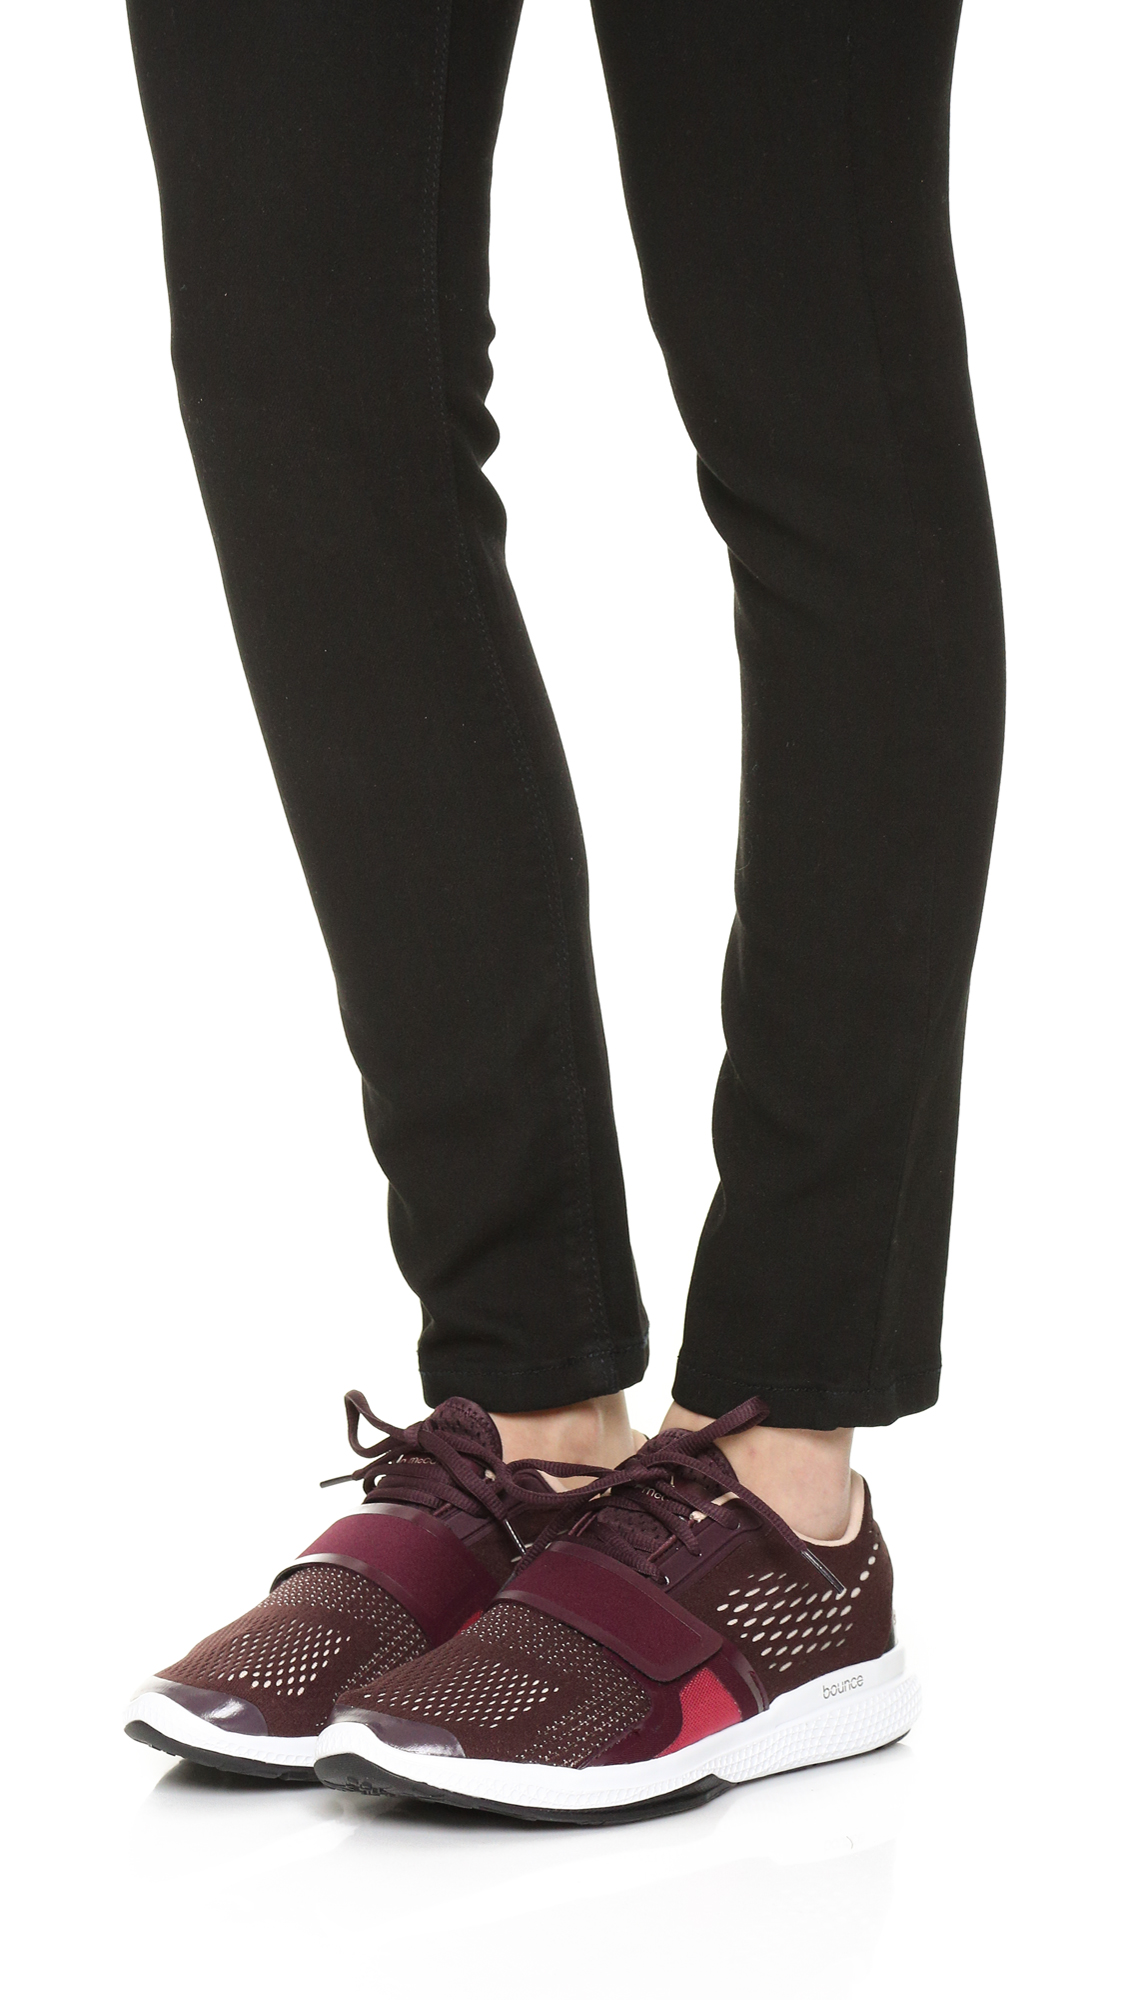 a51b8972e66d0 adidas by Stella McCartney Atani Bounce Sneakers